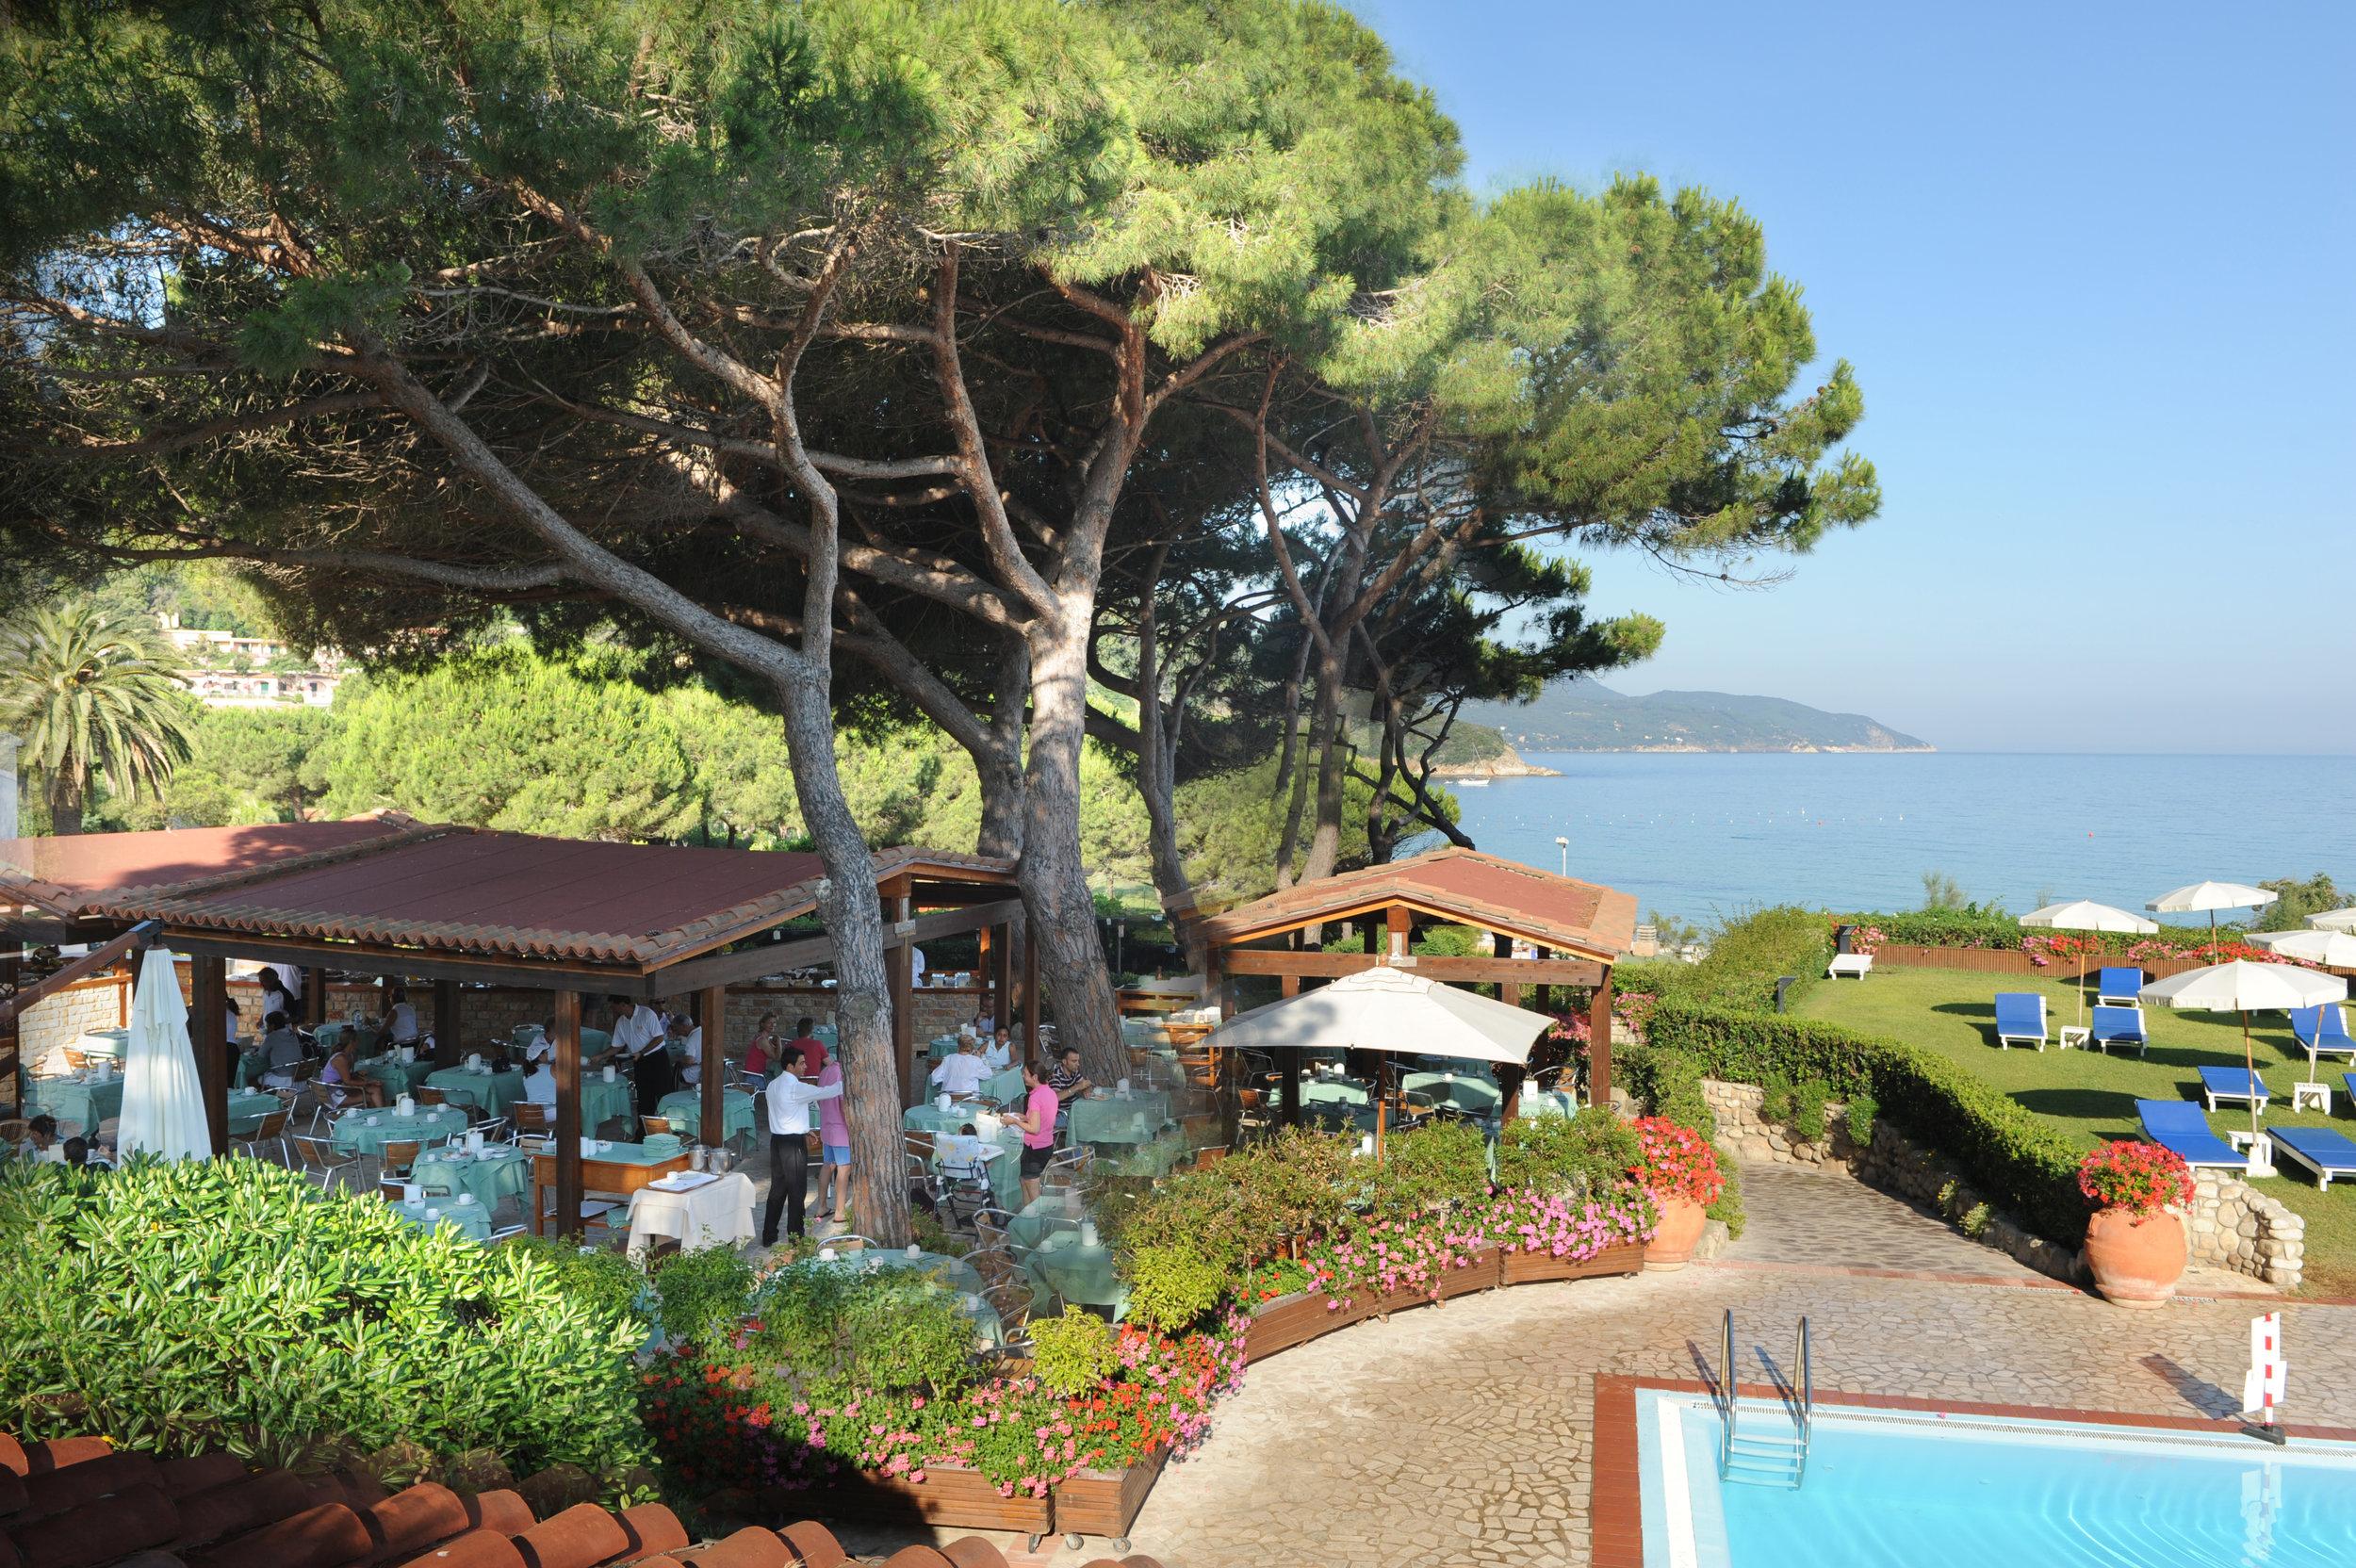 Beautiful Italian charm at the Biodola